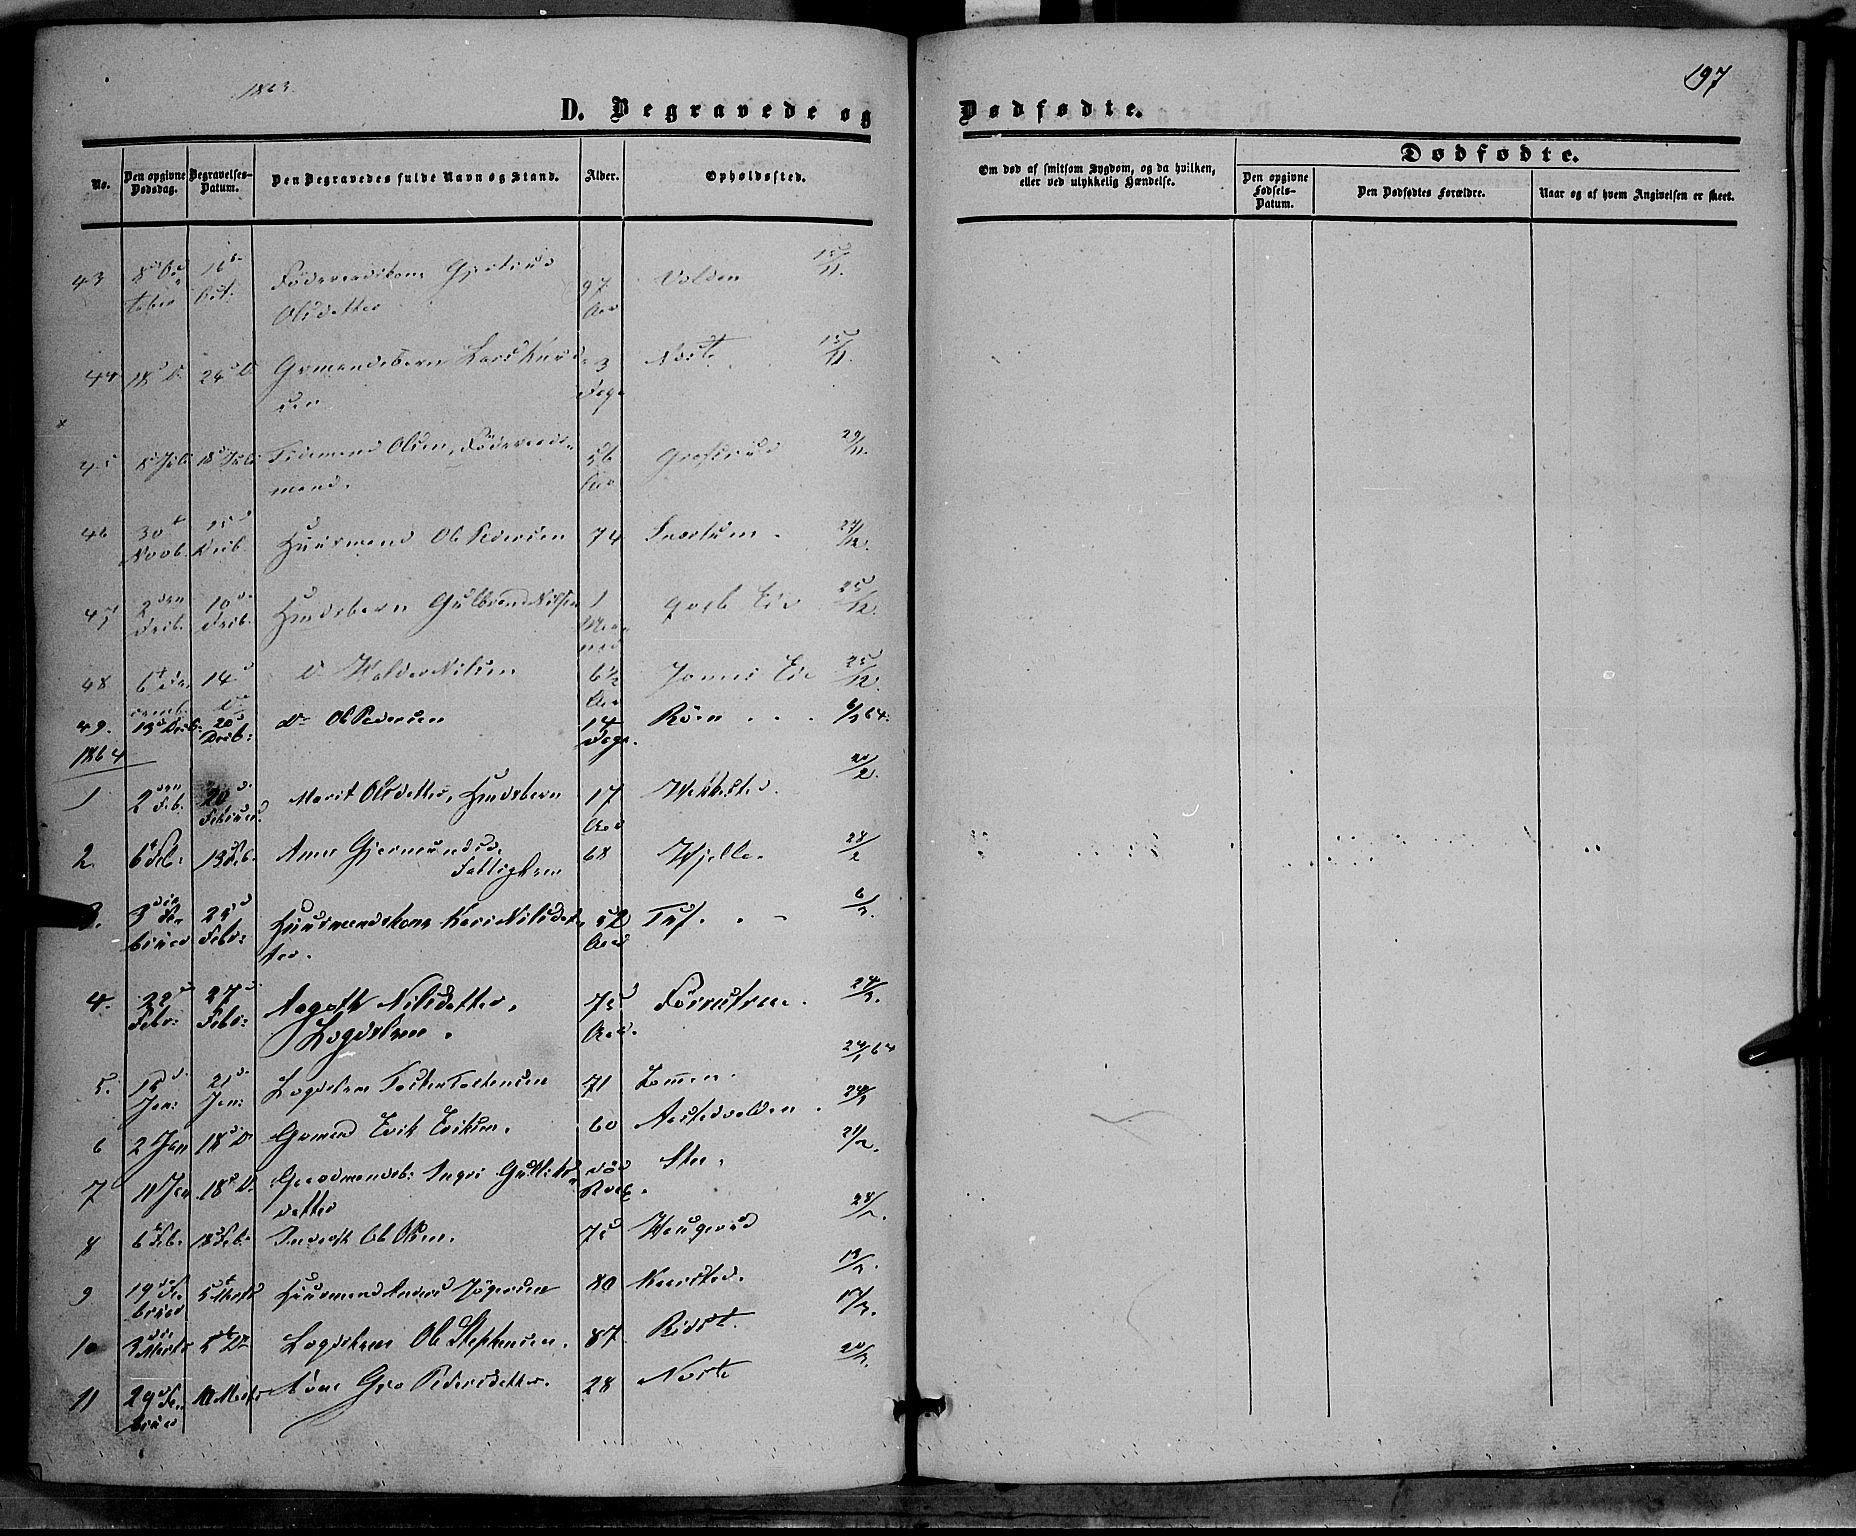 SAH, Vestre Slidre prestekontor, Ministerialbok nr. 2, 1856-1864, s. 197